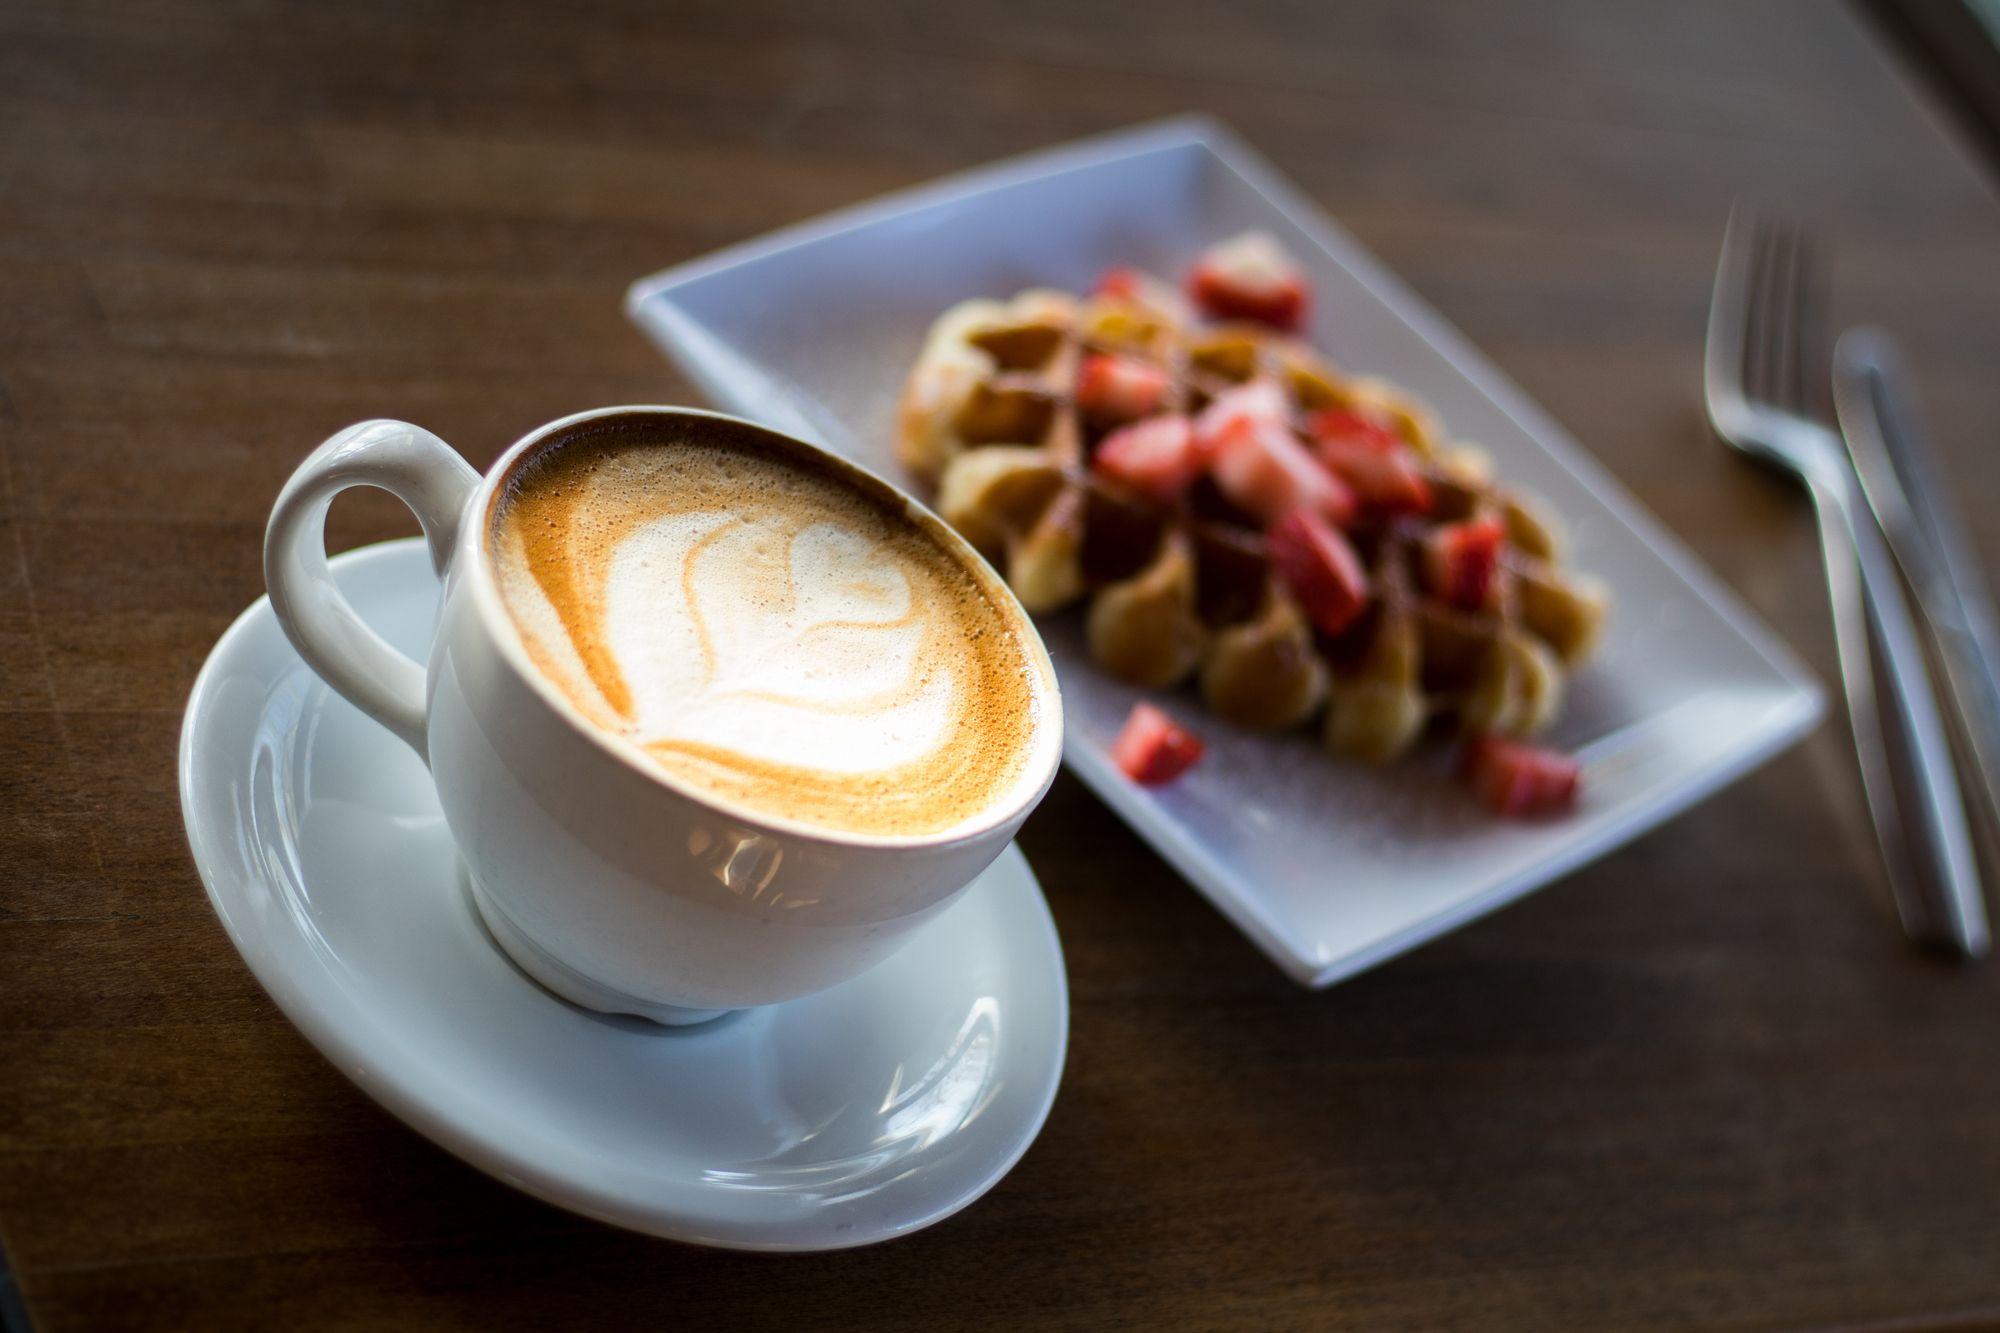 Lazy Sunday featuring an at home Copikup latte . . . . . . #Nespressomoments #Nespressomoment #Nespresso #Nespressocapsule #Nespressowhatelse #coffee #espresso #latte #sunday #espressoathome